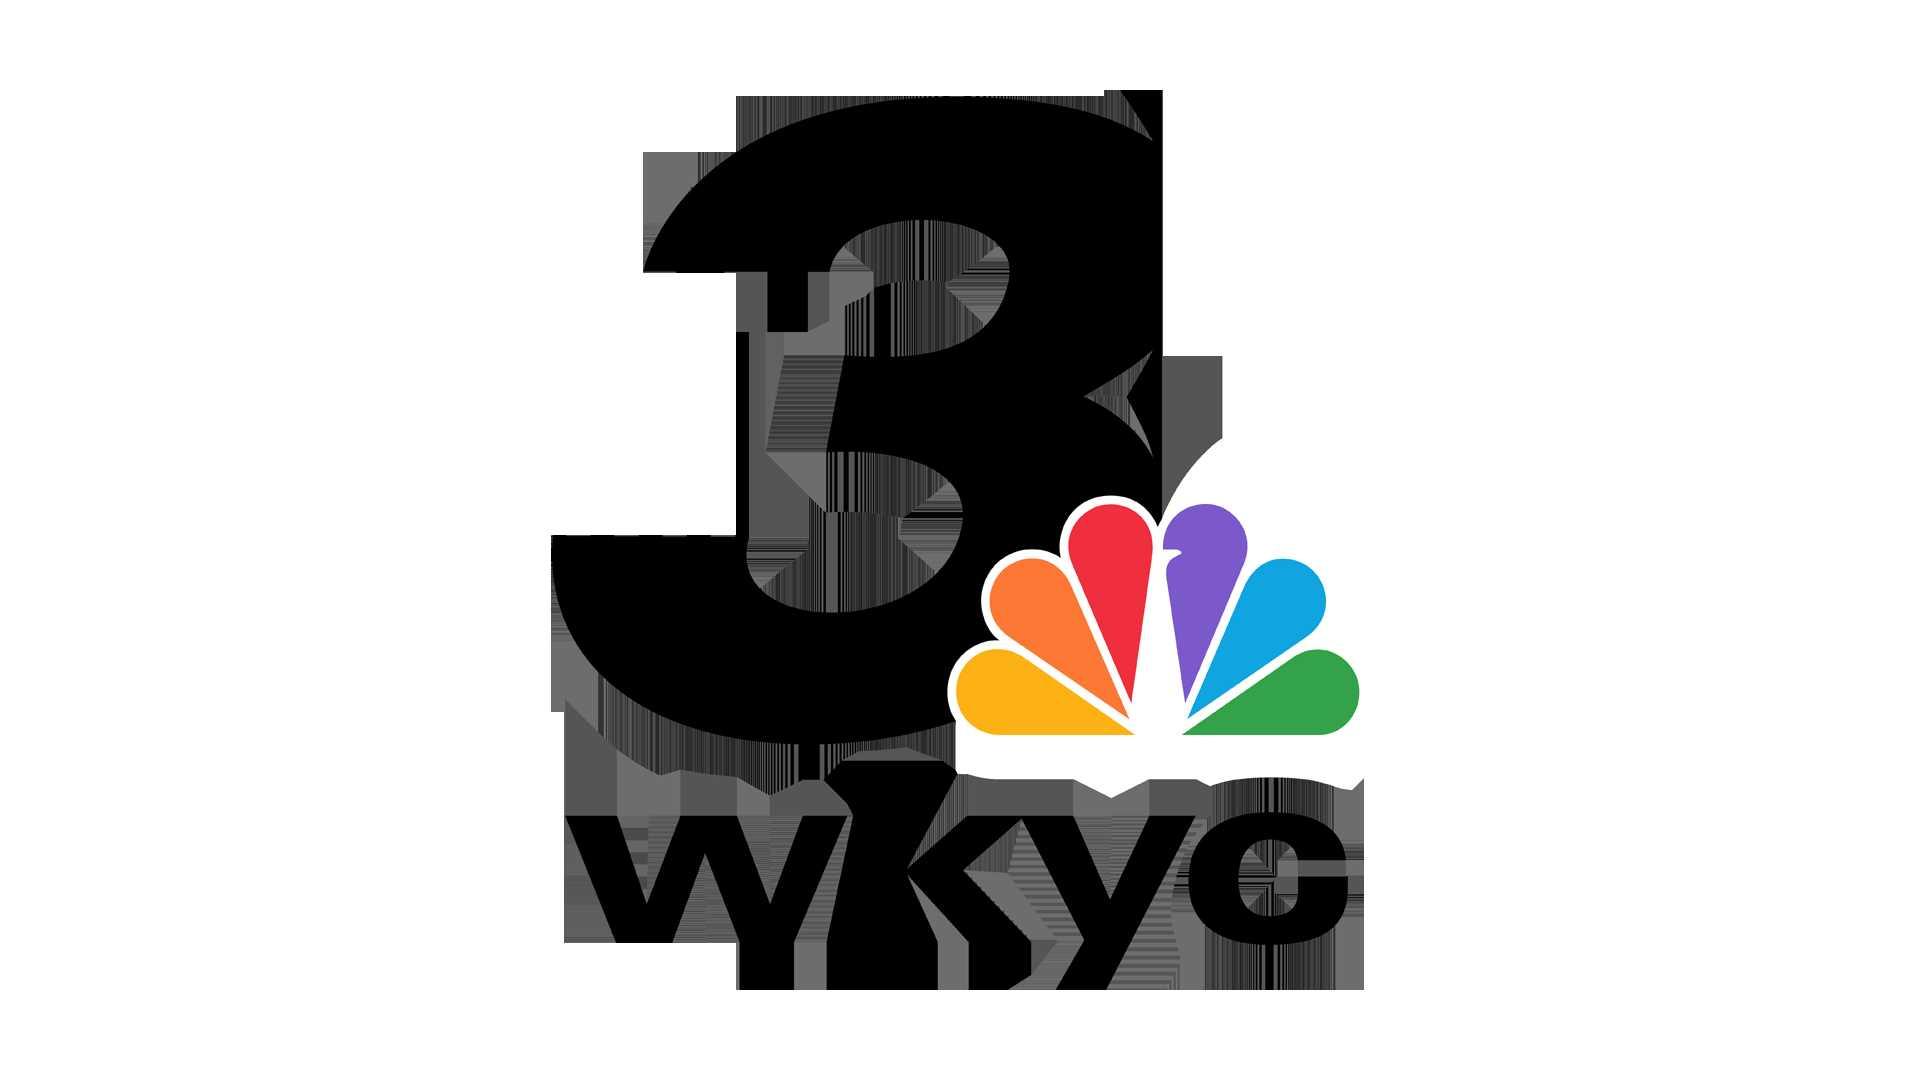 WKYC Channel 3